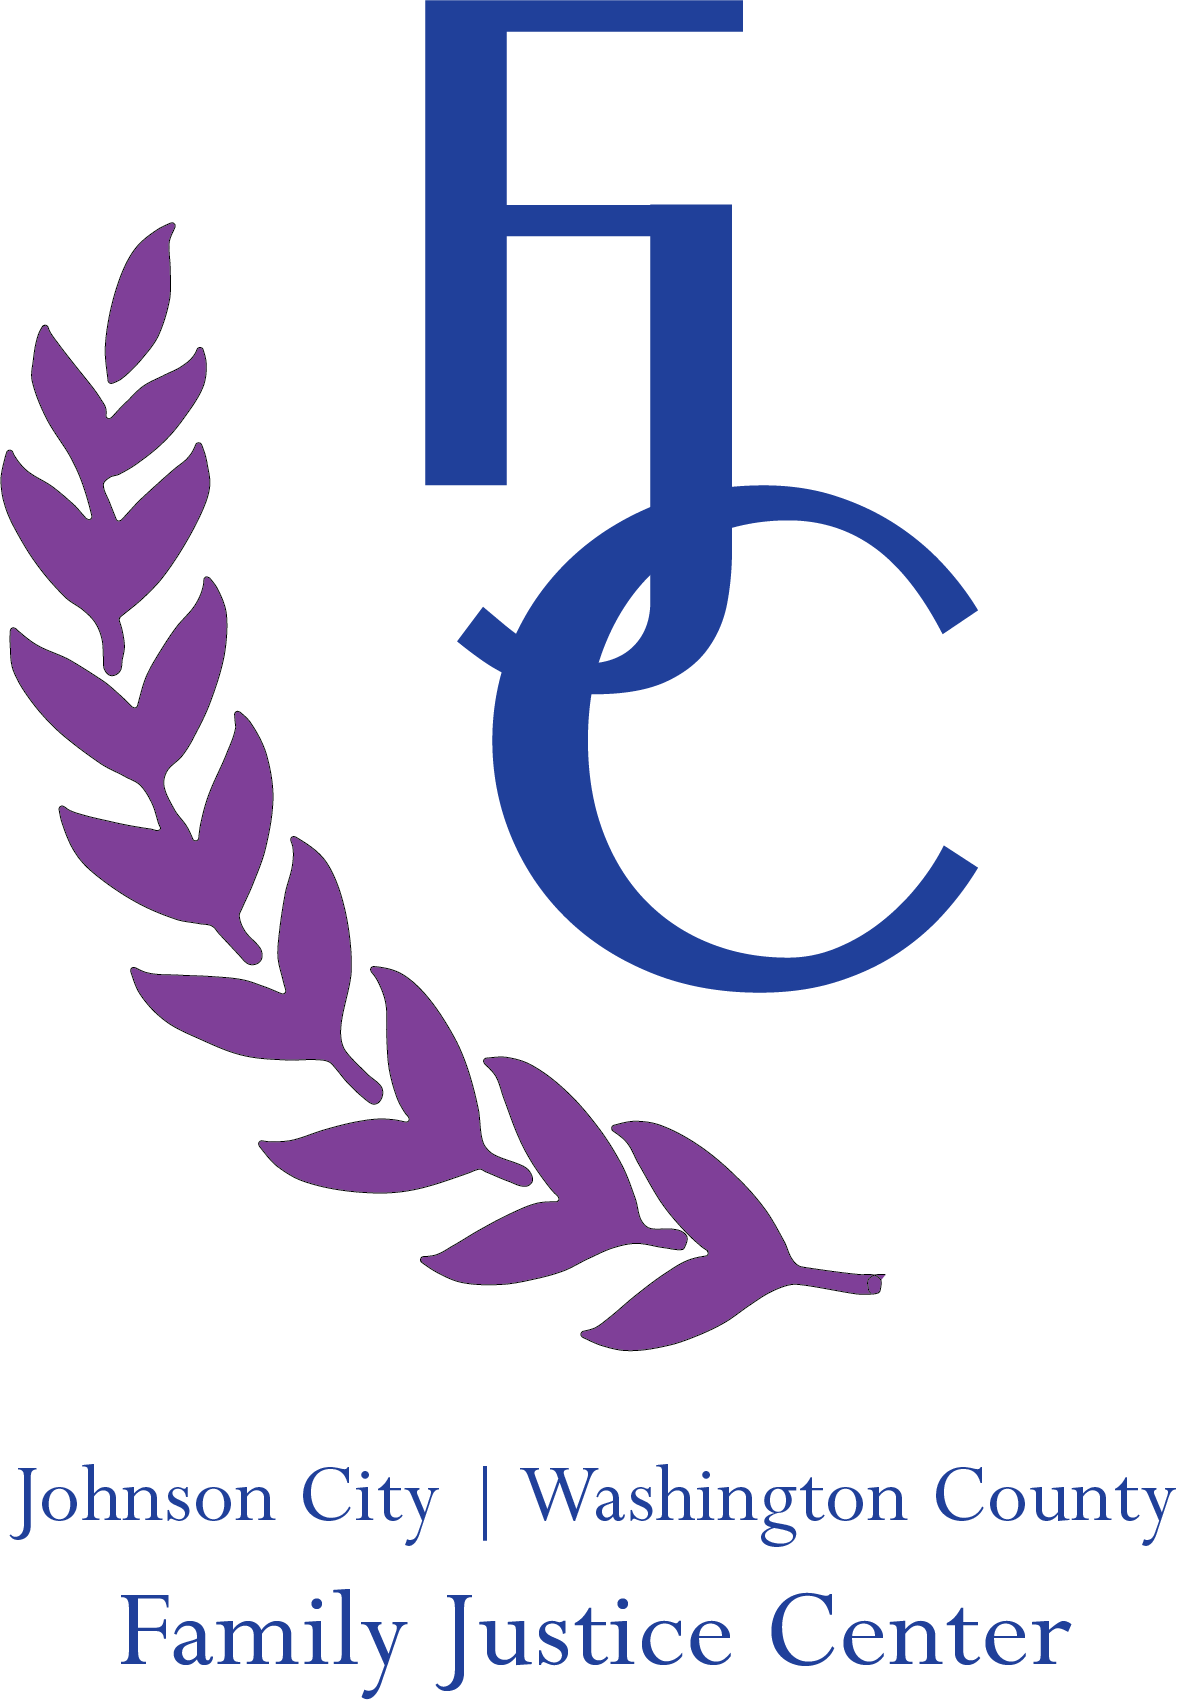 FJC_logo_no_bg.png